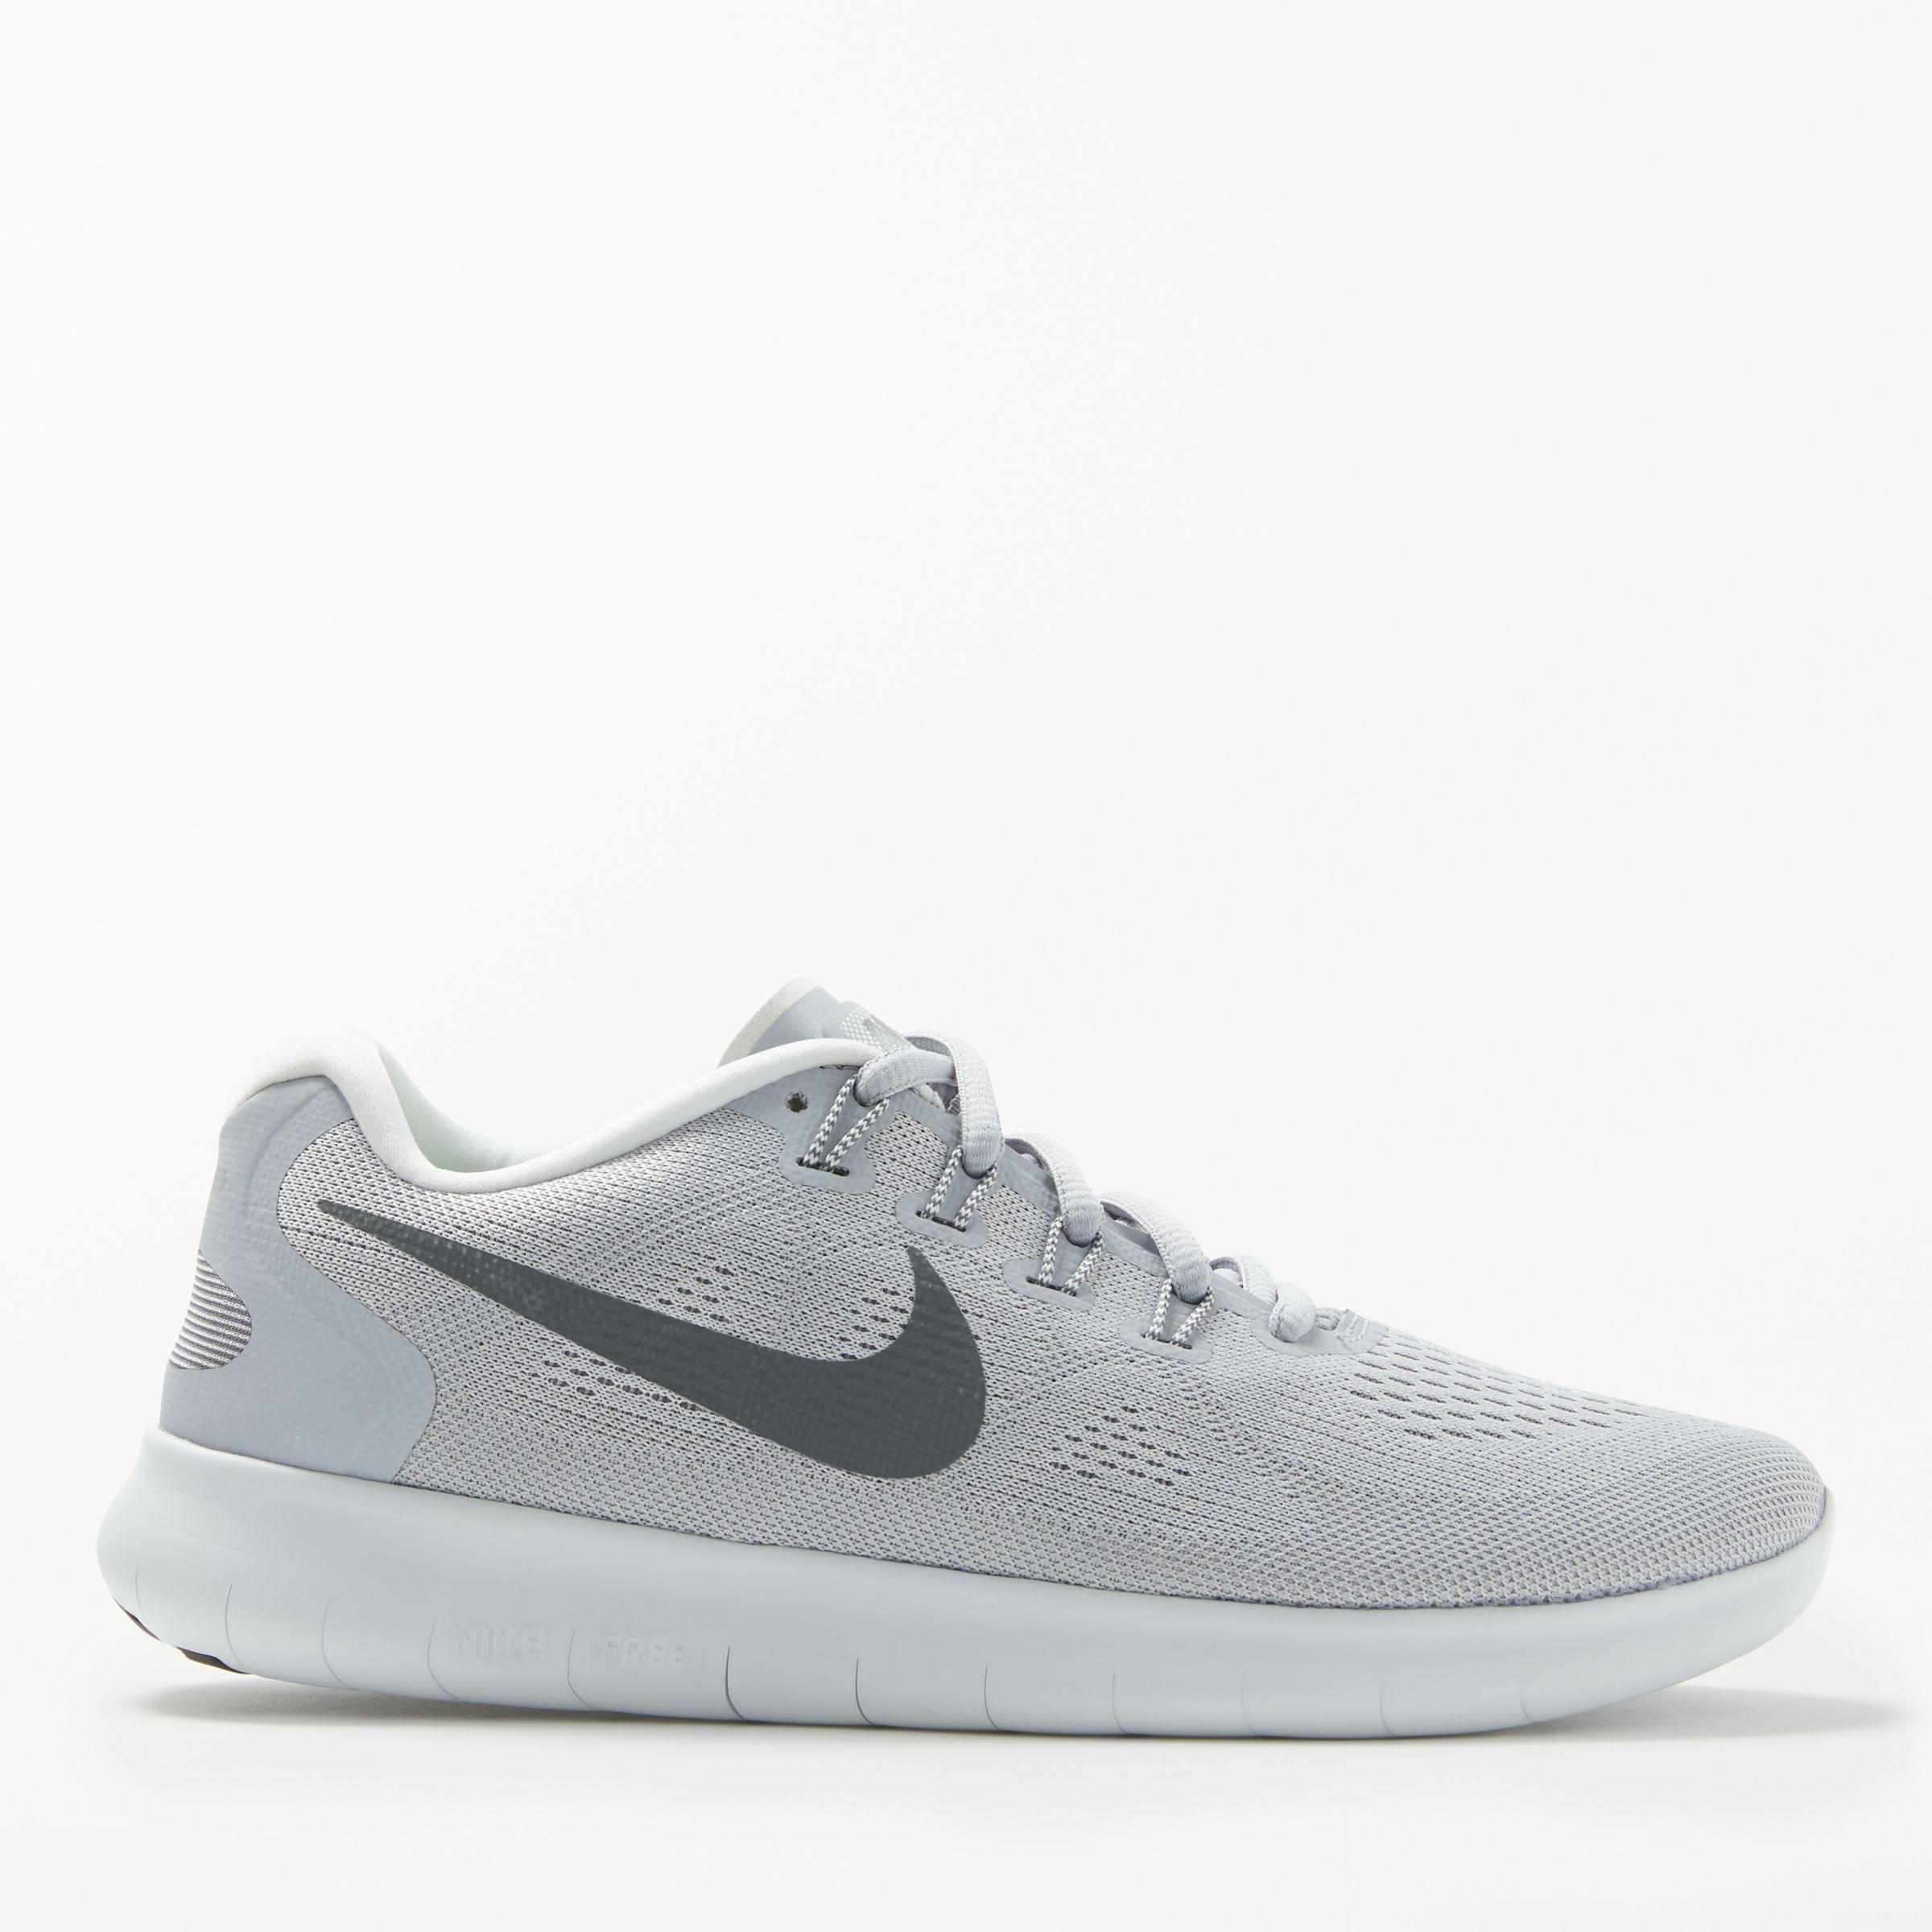 lowest price e1f2b aaac5 Nike Free RN 2017 Women's Running Shoes, Wolf Grey/Dark Grey ...